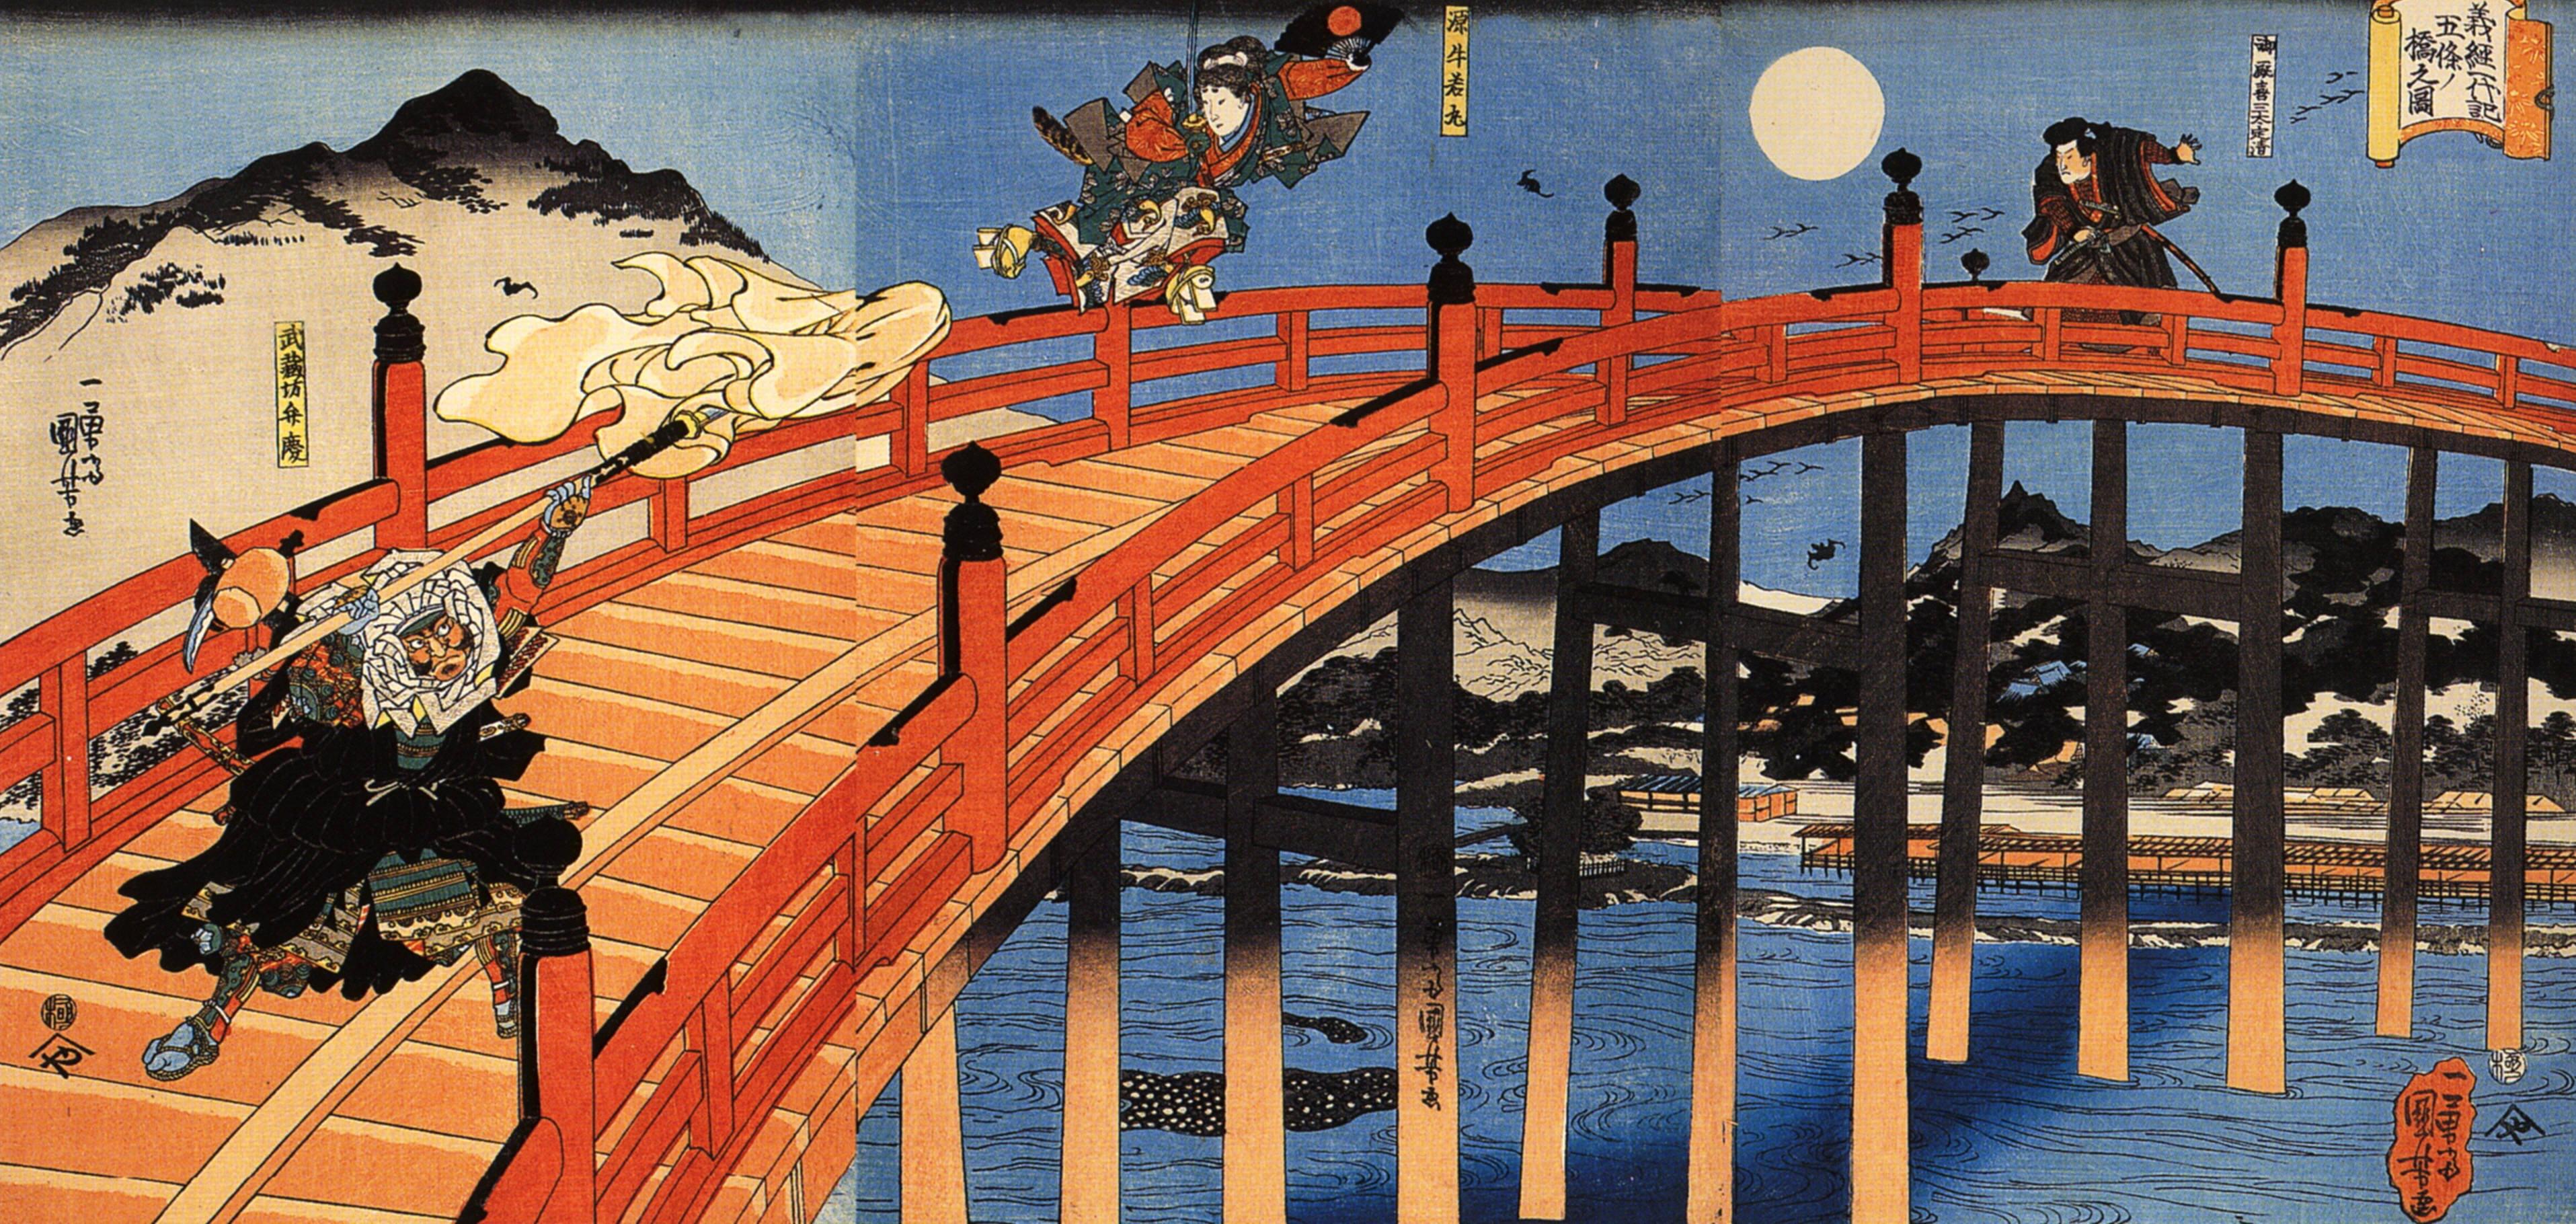 Painting of the duel between Yoshitsune and Benkei